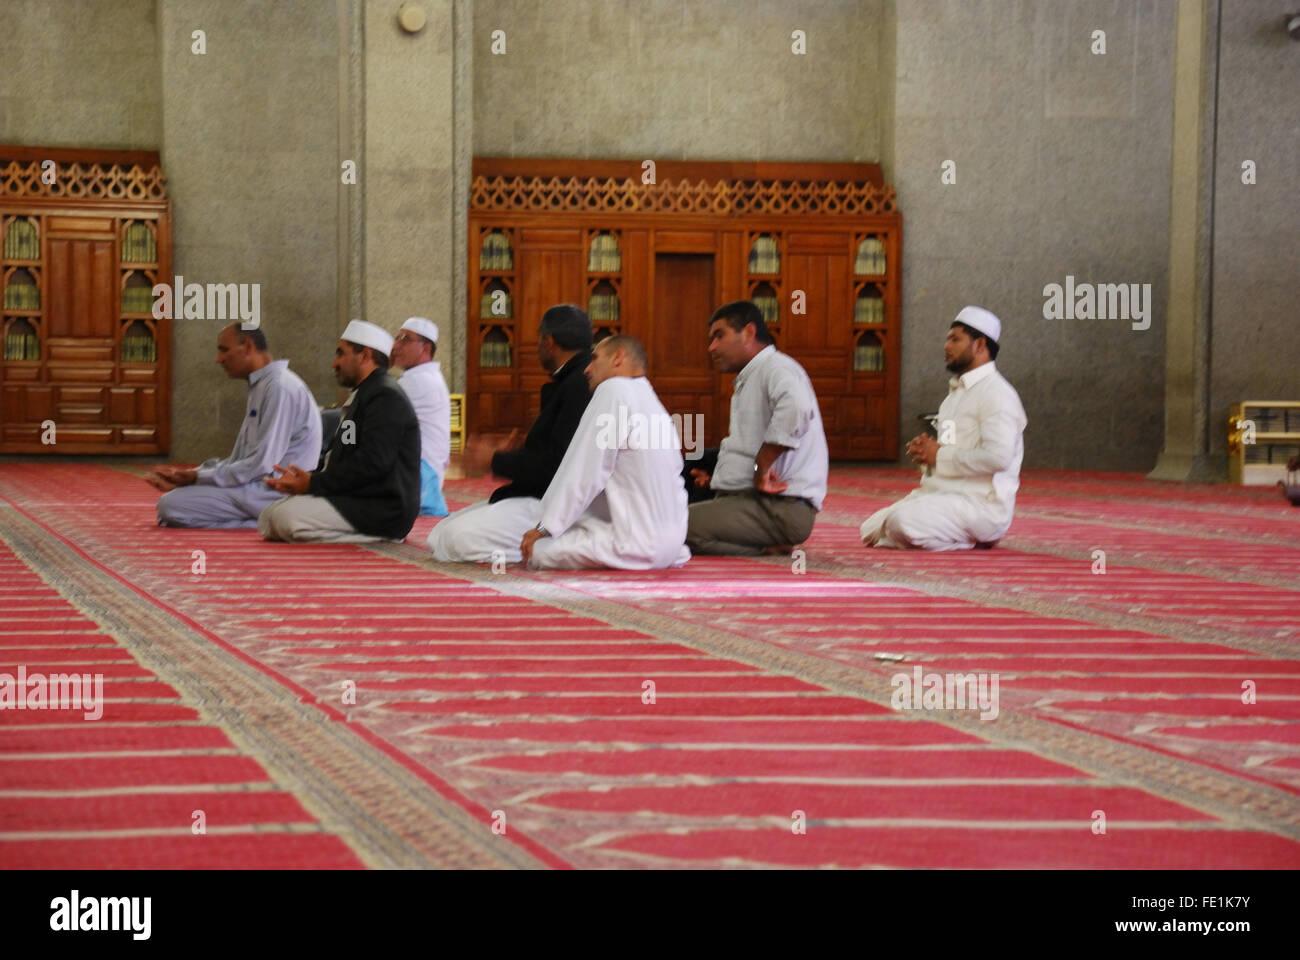 Men inside Masjid Quba, the very first Mosque that was built, Medina, Saudi Arabia - Stock Image